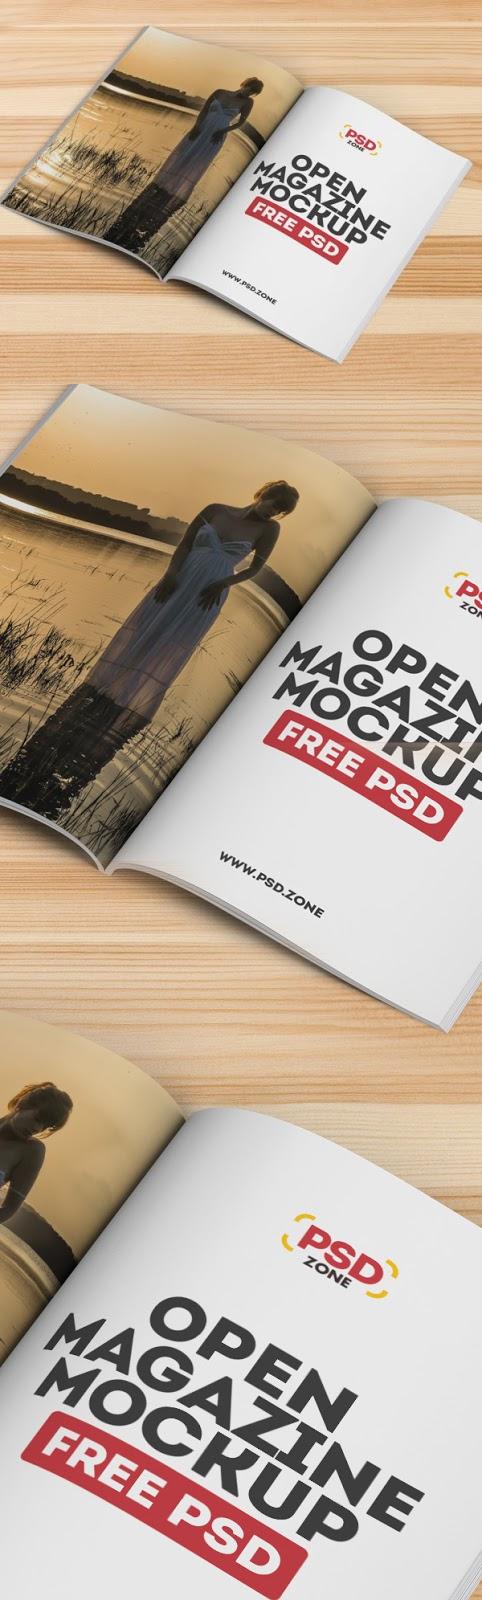 Download Free Mockup PSD 2018 - Open Magazine Mockup Free PSD